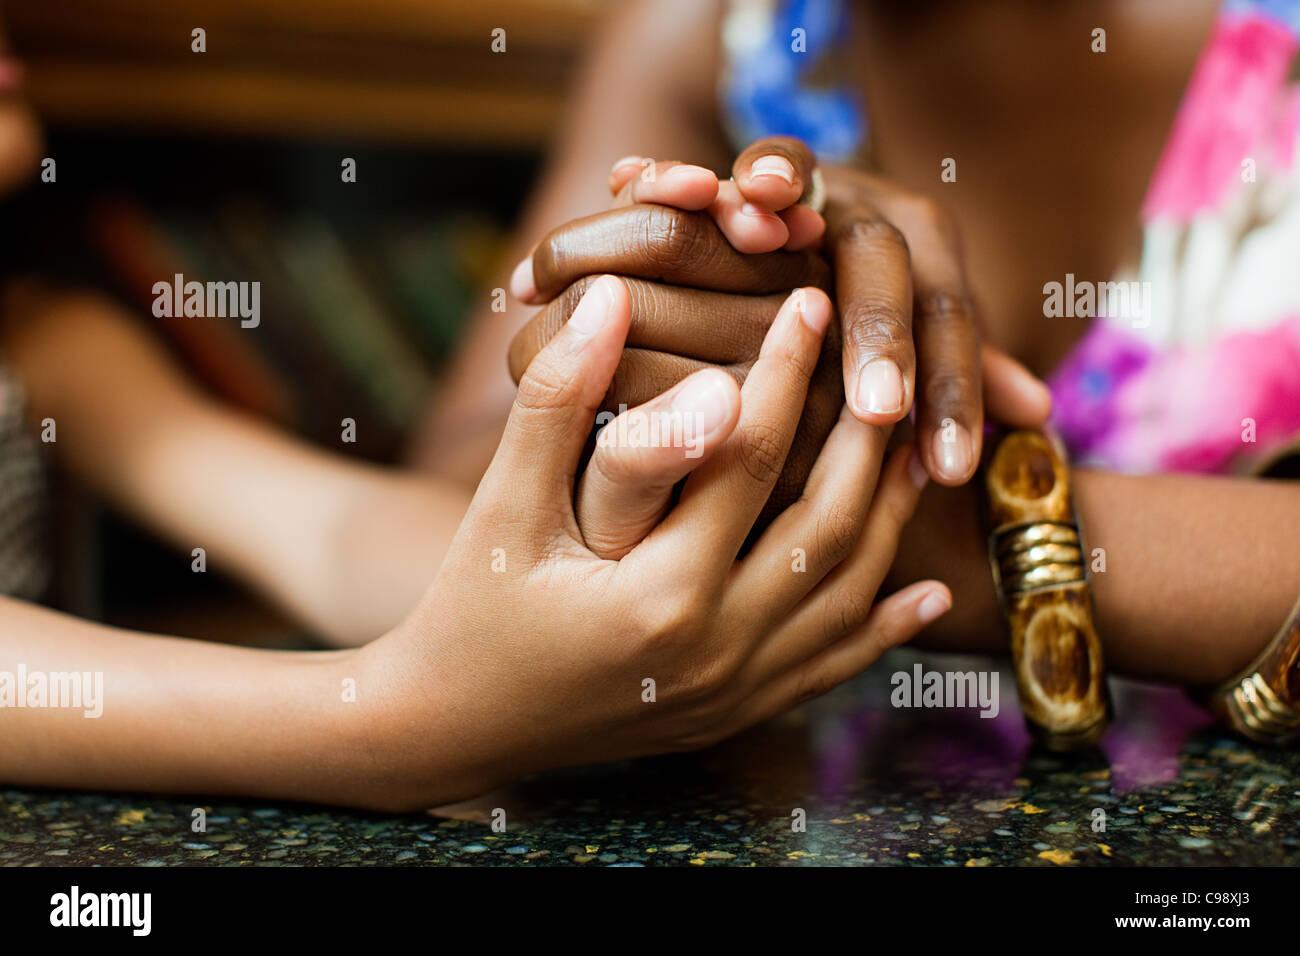 Madre e hija manos en cafe Imagen De Stock